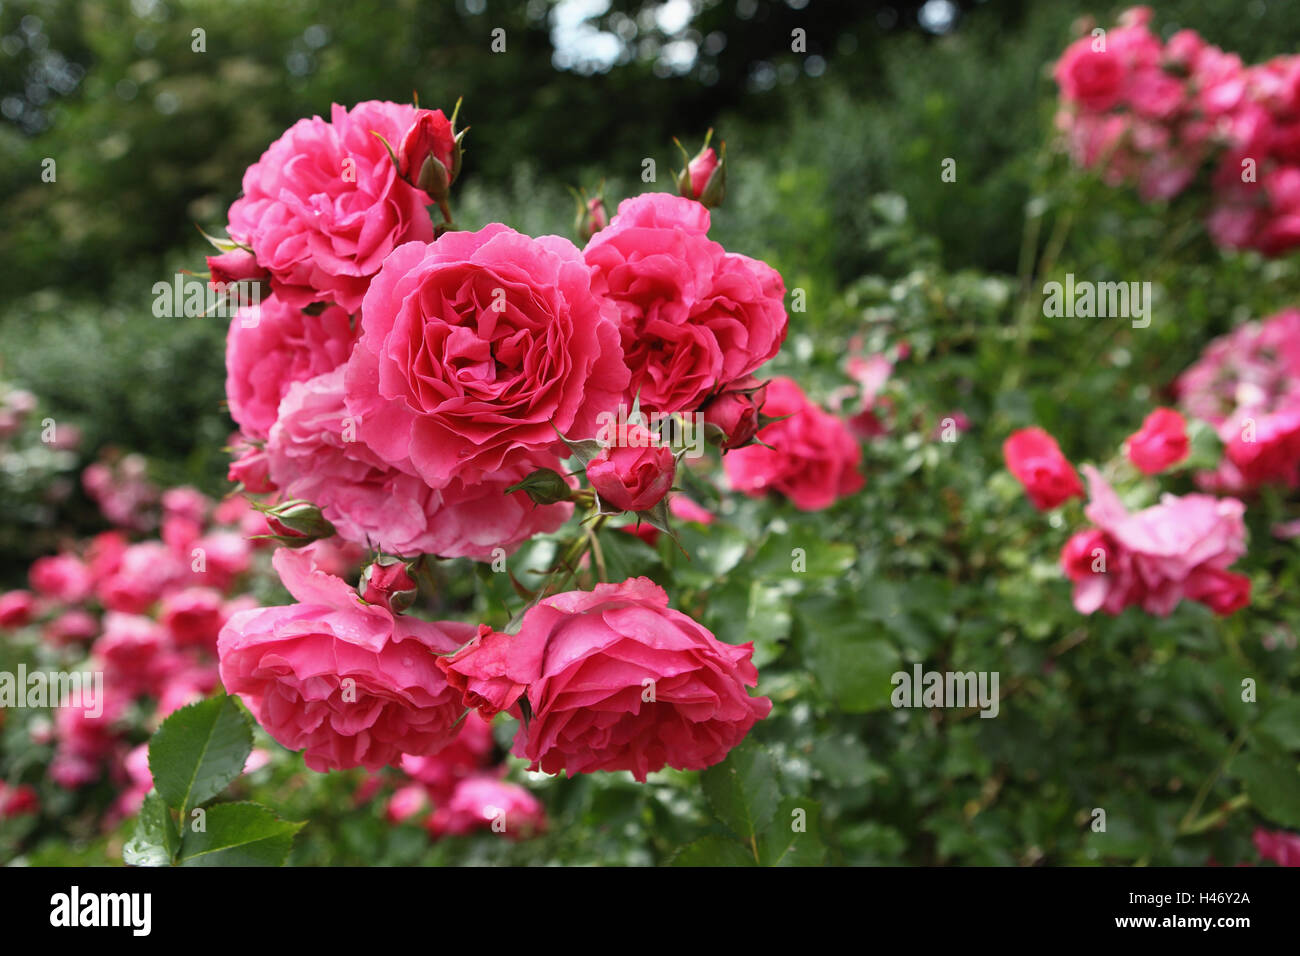 1, jardin luxuriant avec rosiers, Photo Stock